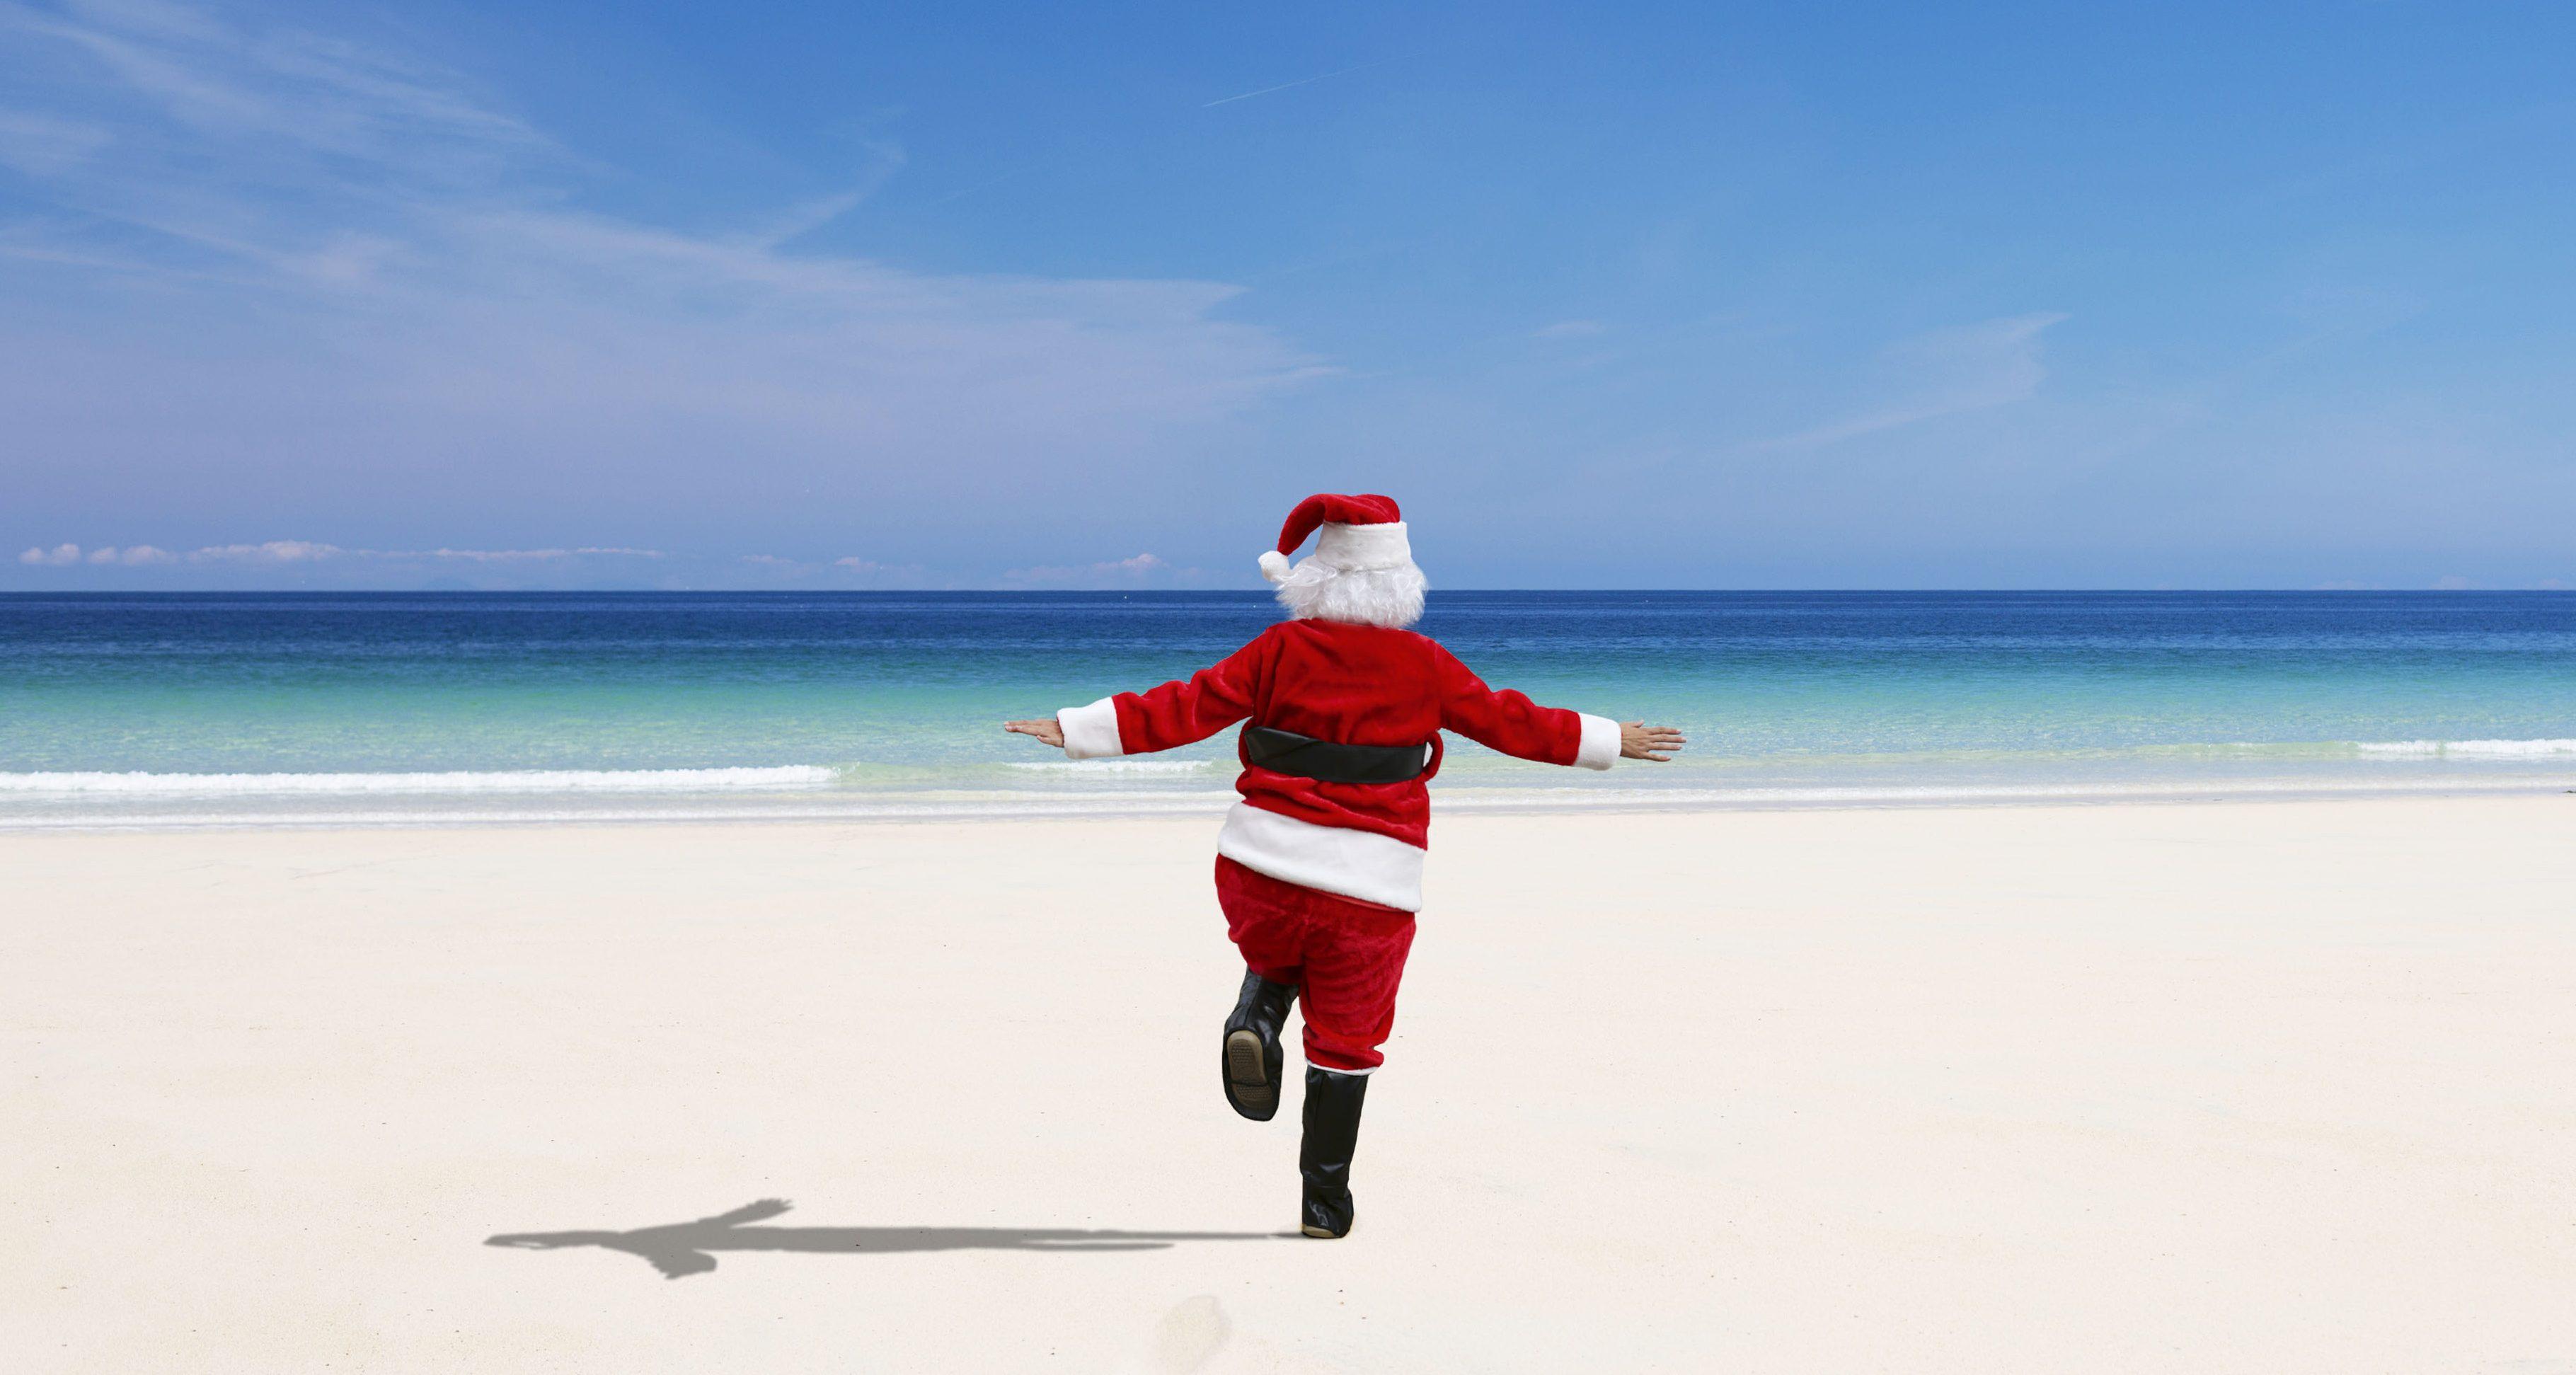 sommerferie, strand, varme, sol, afslapning, hygge